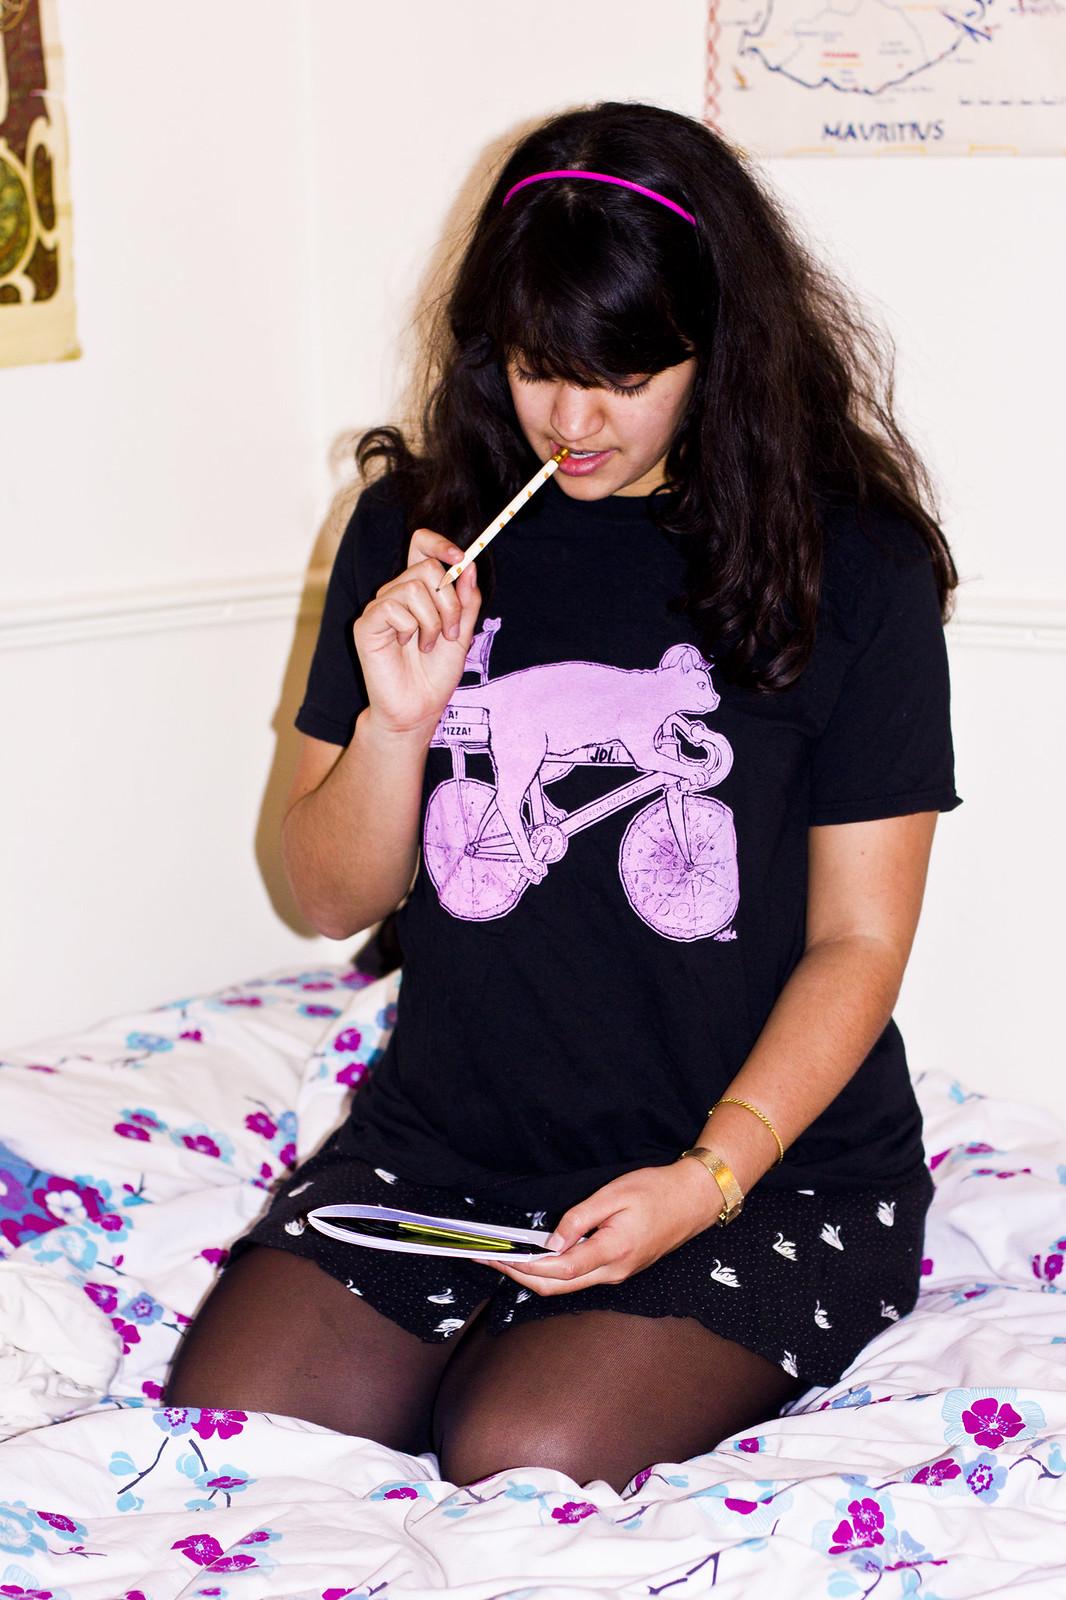 laila tapeparade bed sat down screen printed printing t shirt